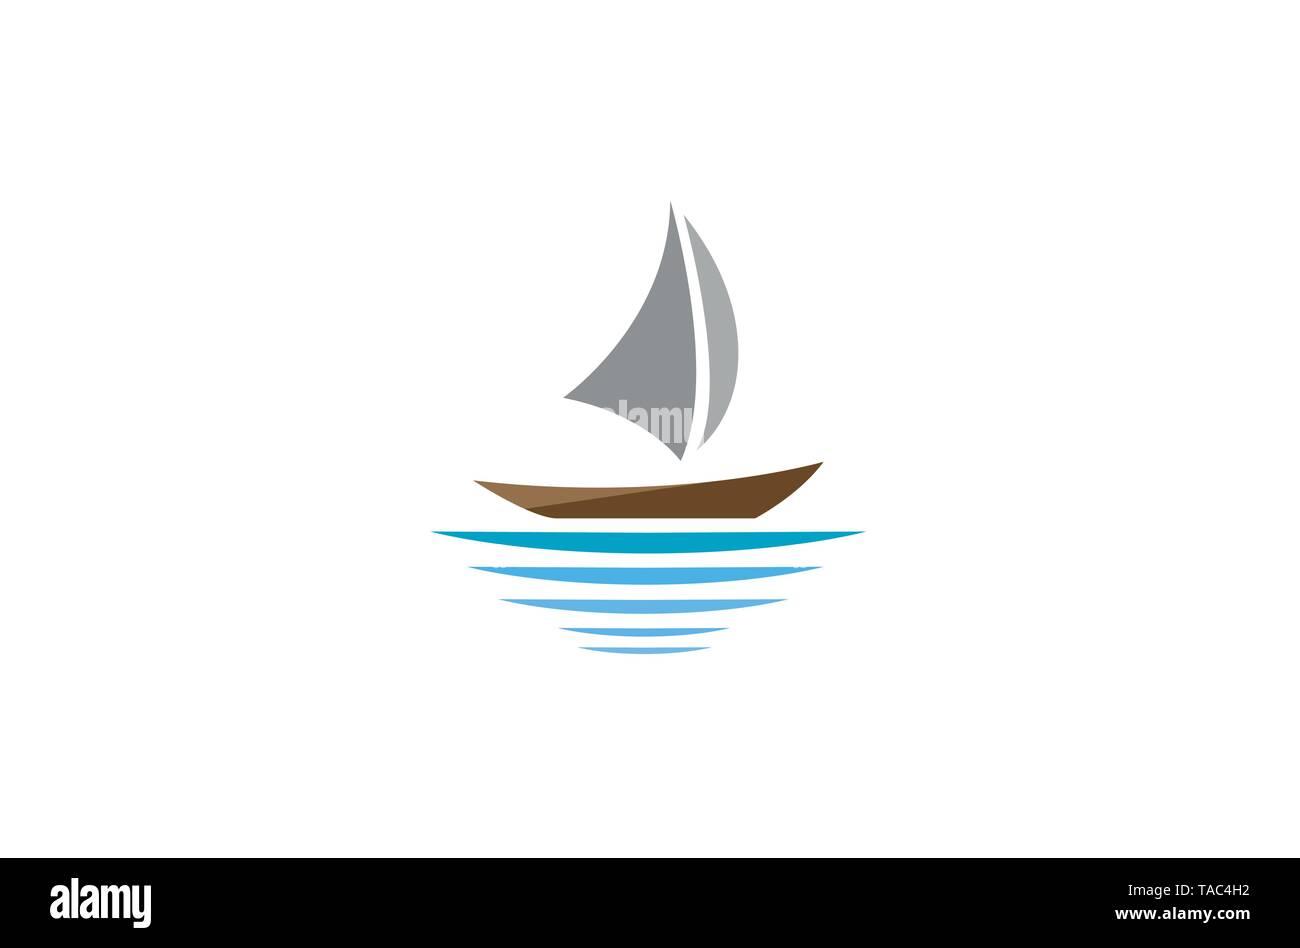 Sailing Boat logo - Stock Image